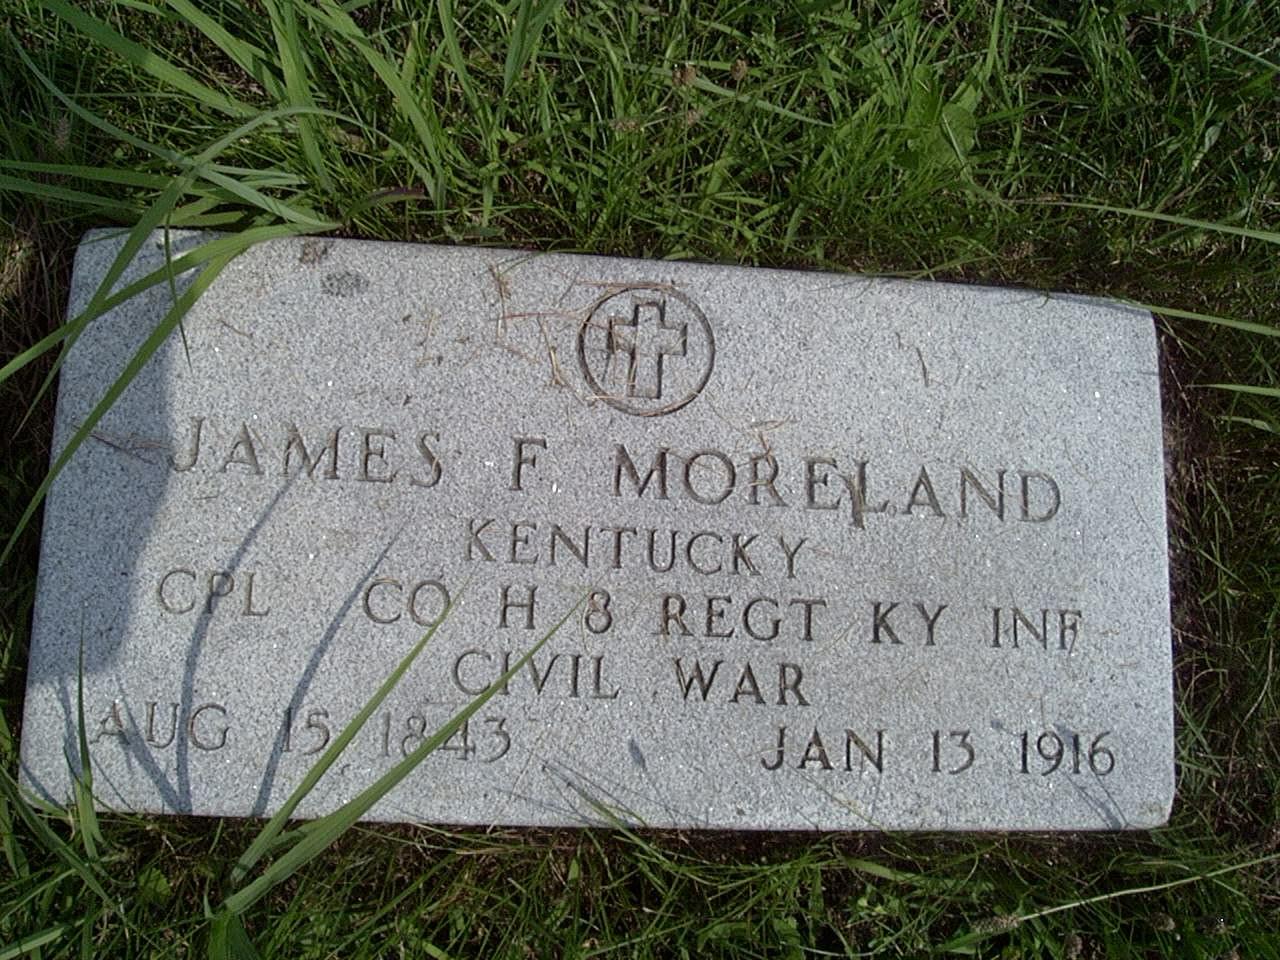 James Francis Moreland